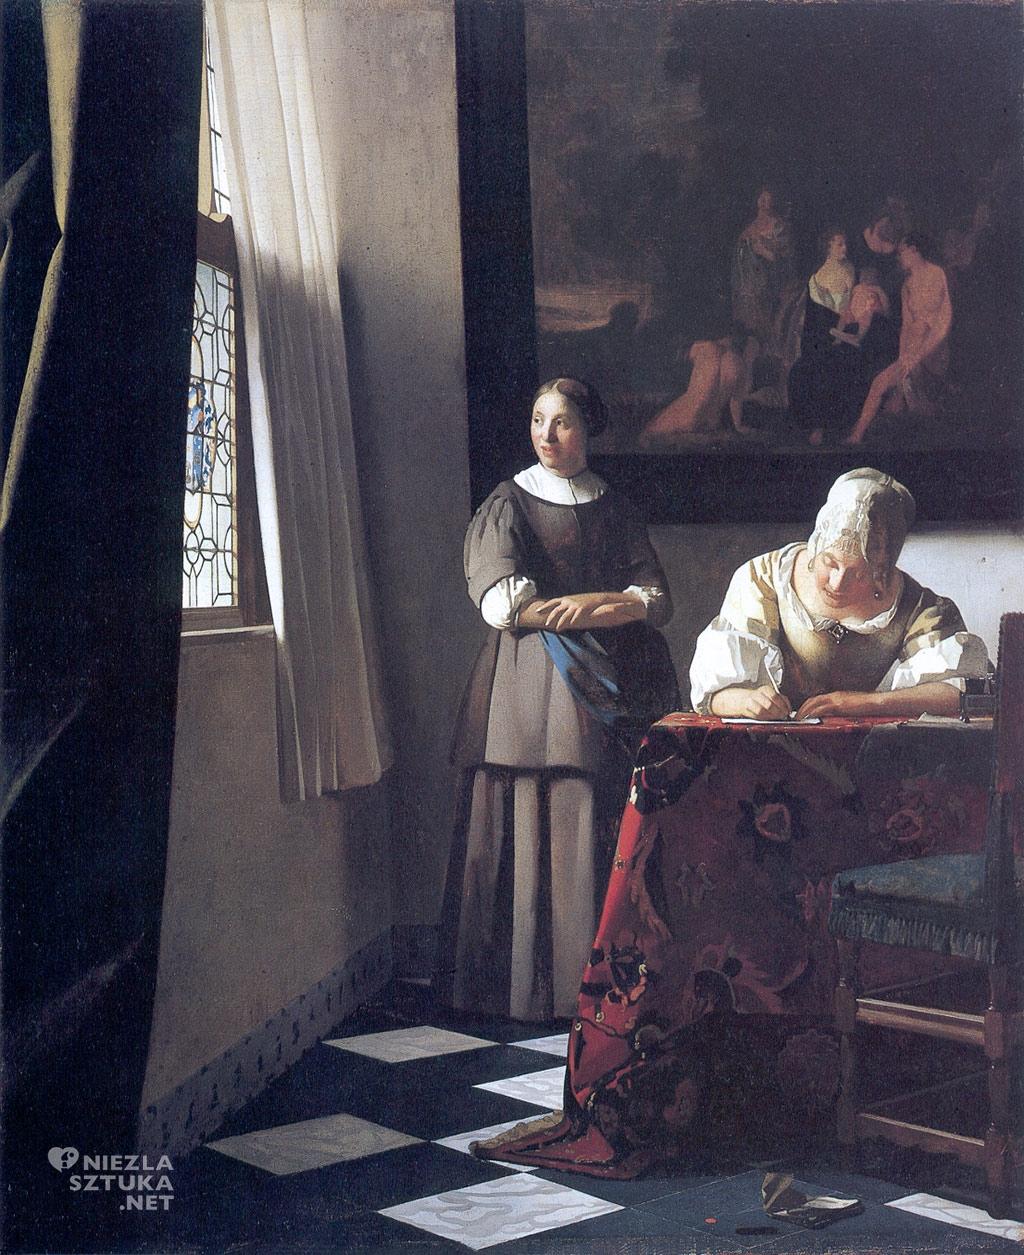 Johannes Vermeer, Pisząca list, malarstwo niderlandzkie, Niezła Sztuka